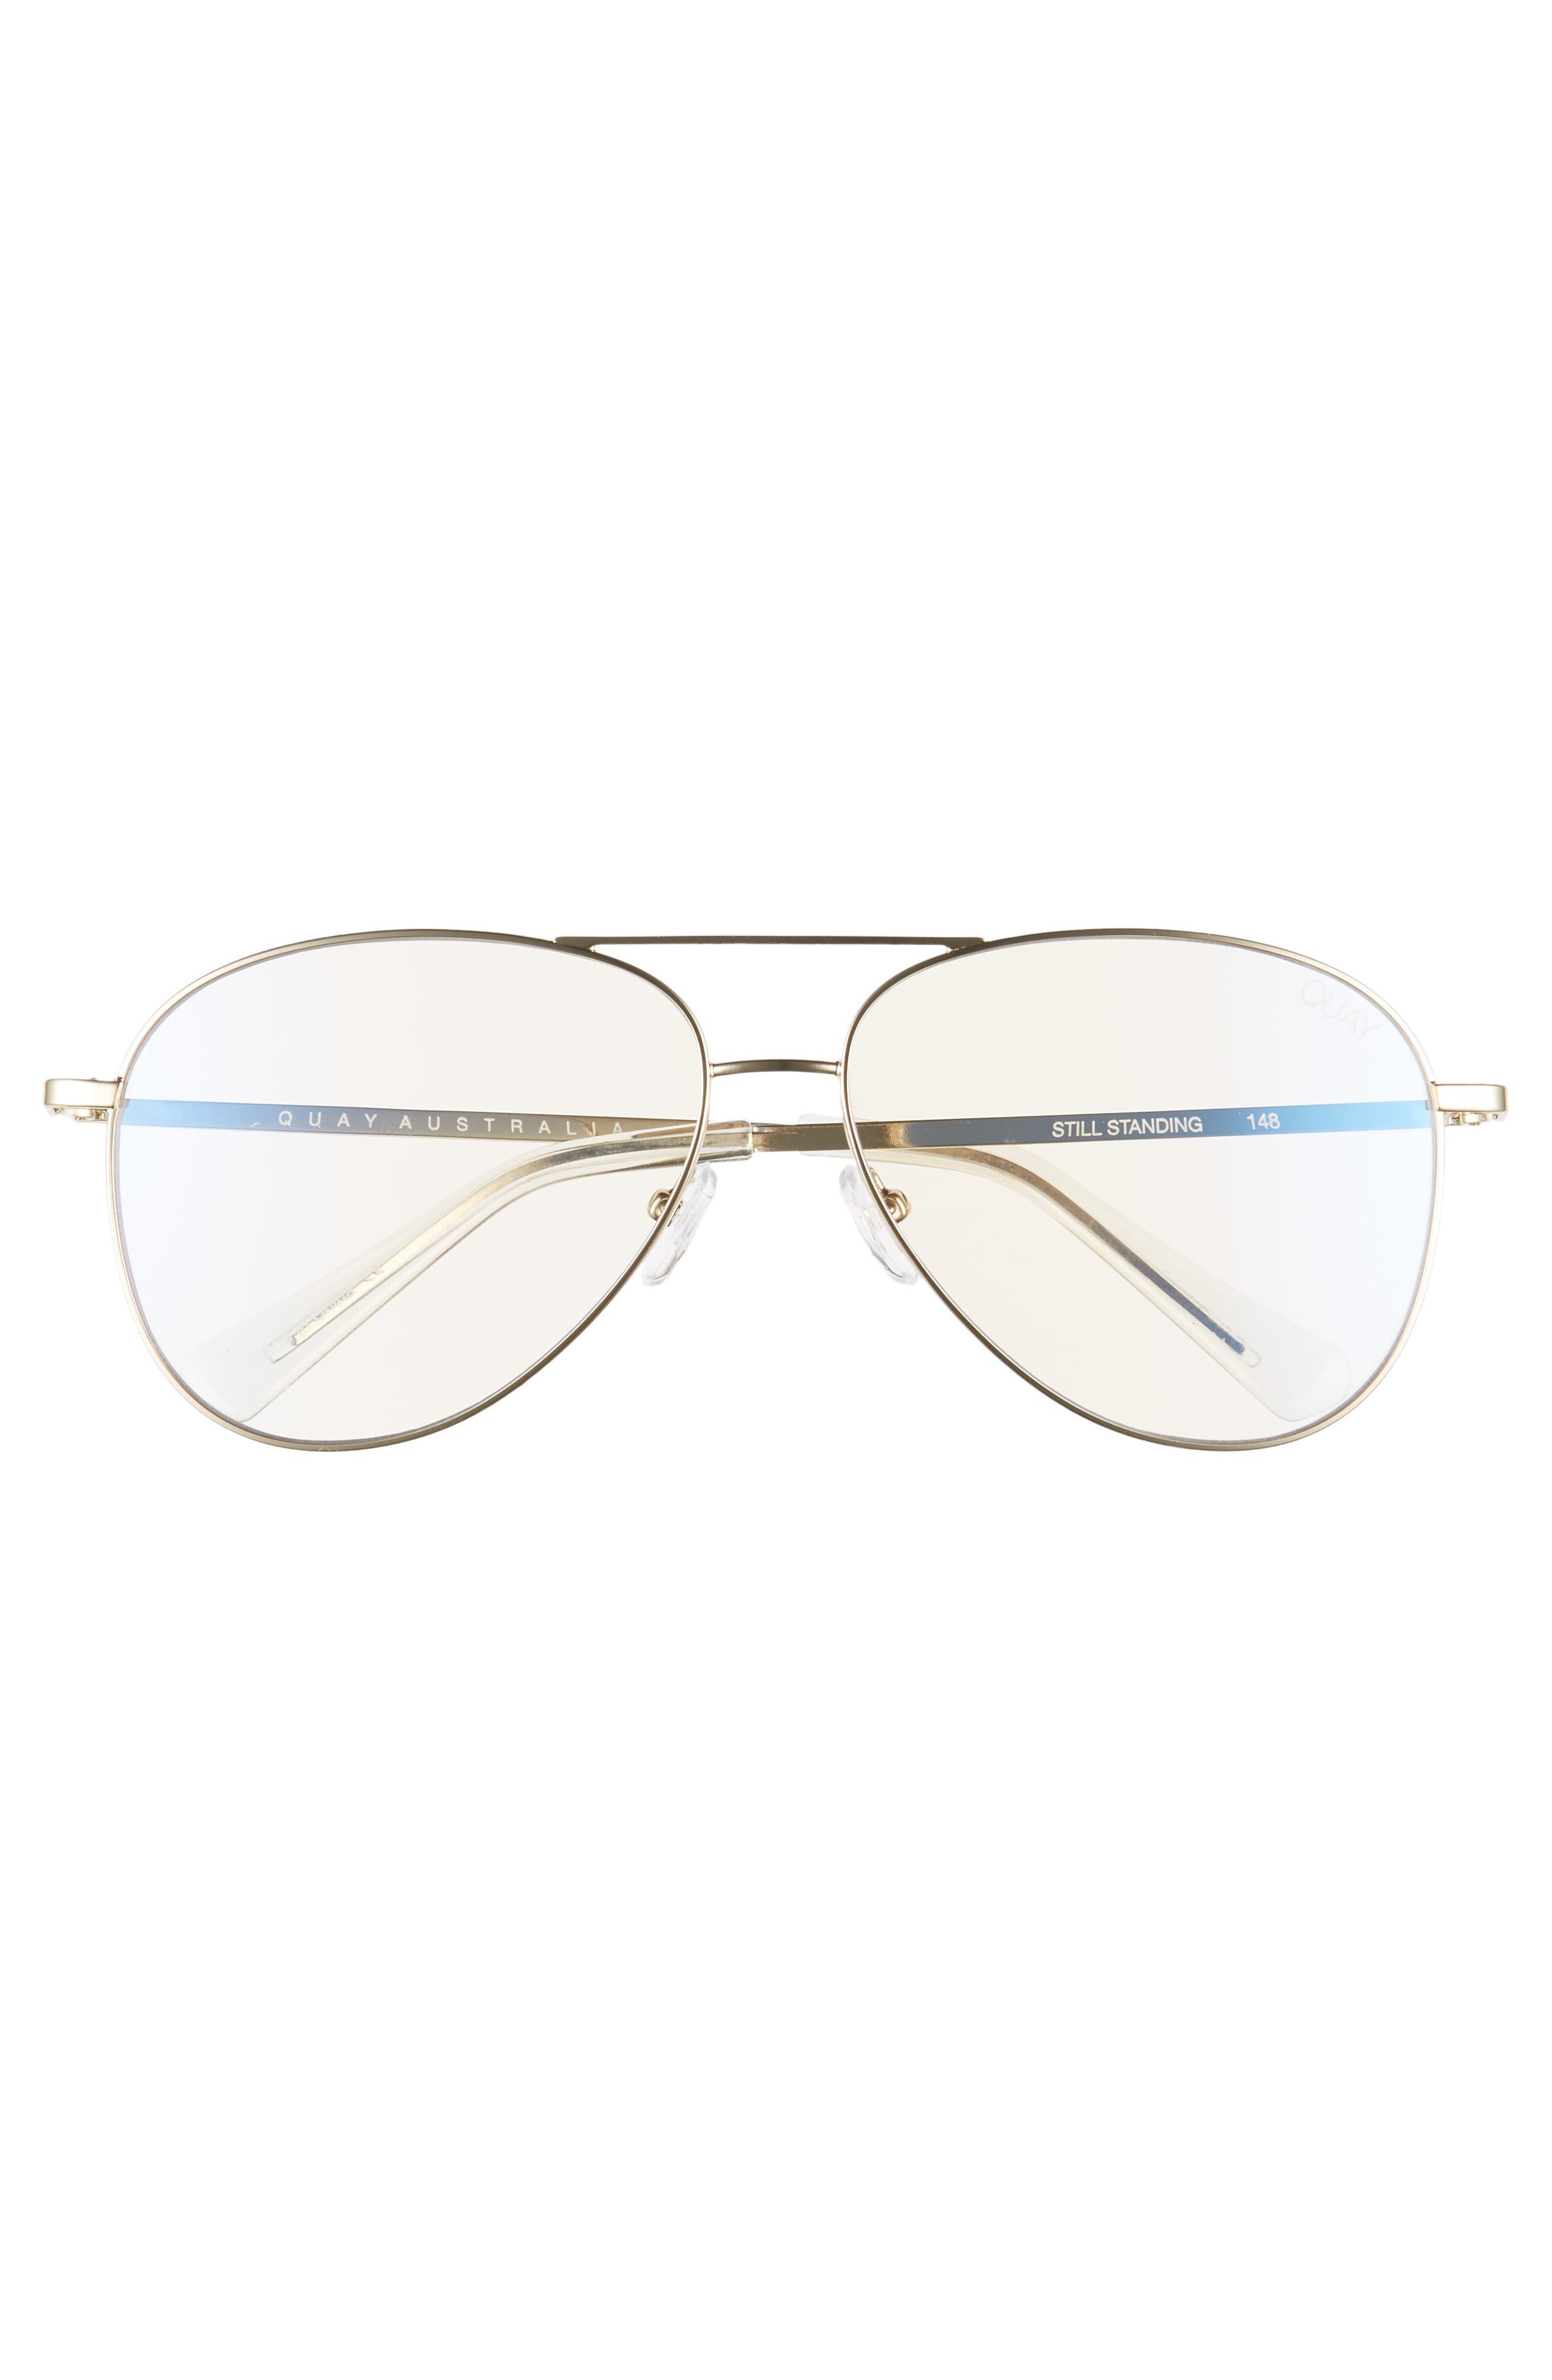 Still Standing 58mm Aviator Fashion Glasses,                             Alternate thumbnail 3, color,                             GOLD / CLEAR BLUE LIGHT